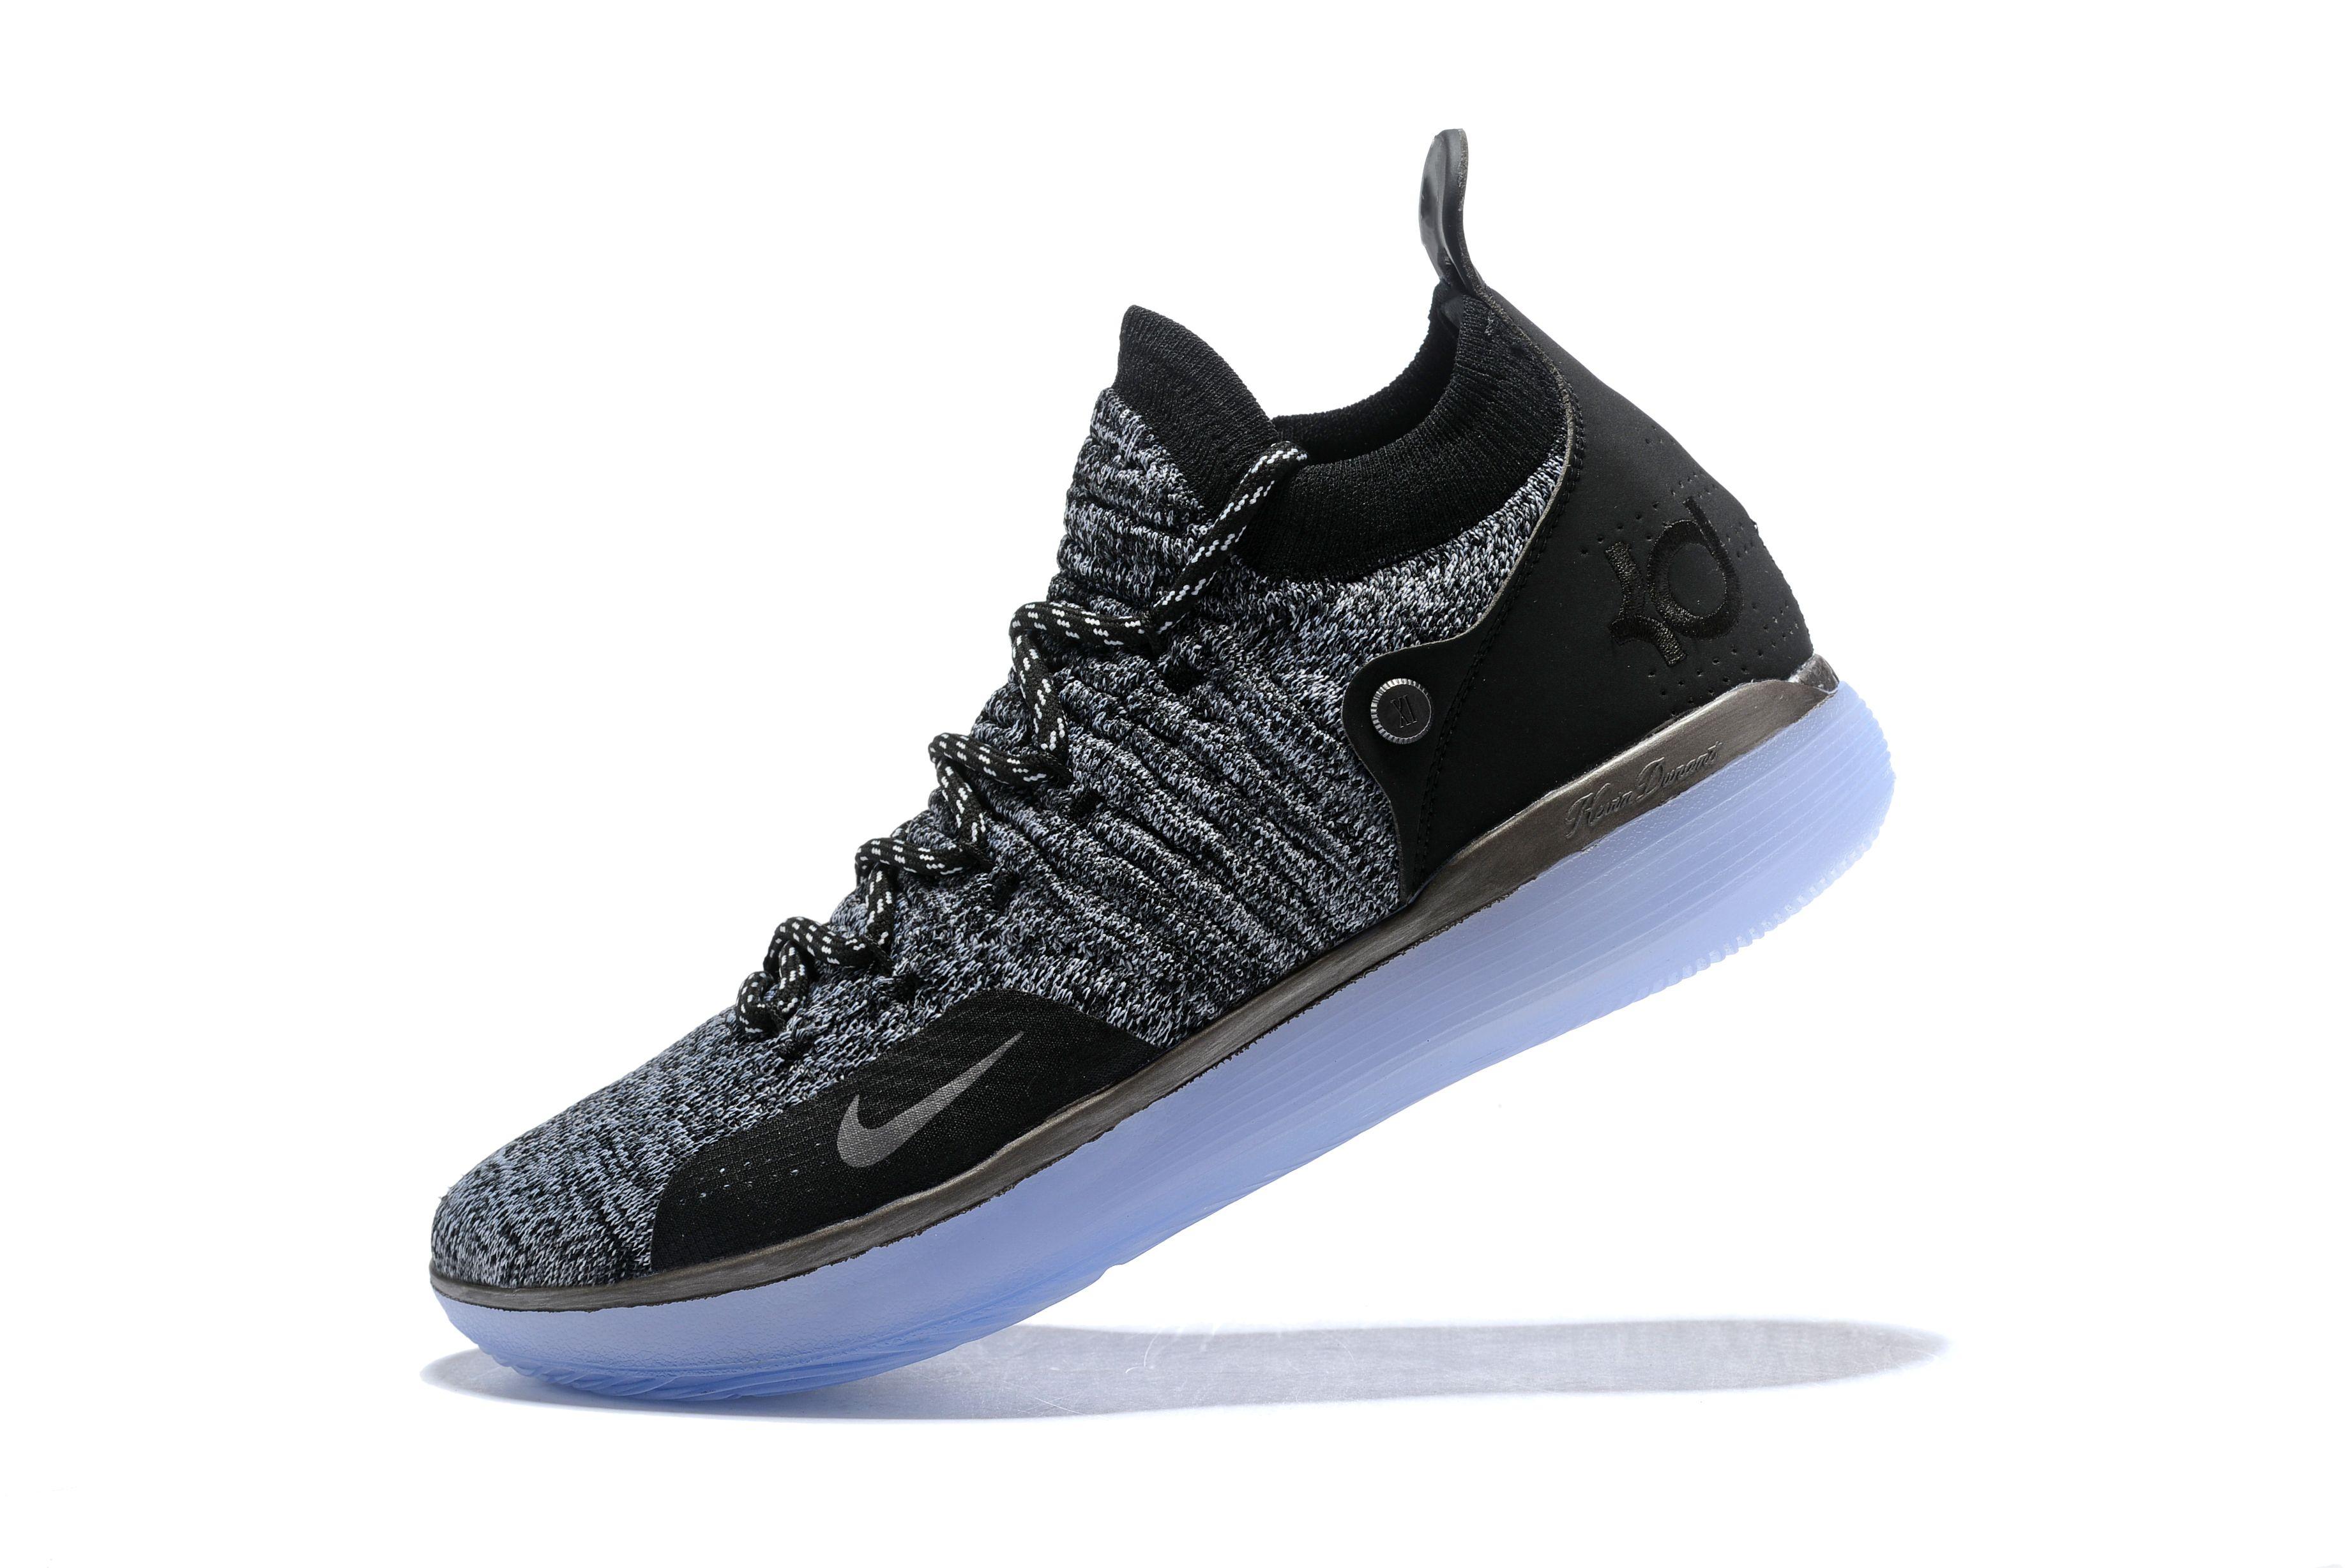 High Quality kevin durants nike kd 11 still kd black grey shoes Online Sale 15d4a9b60